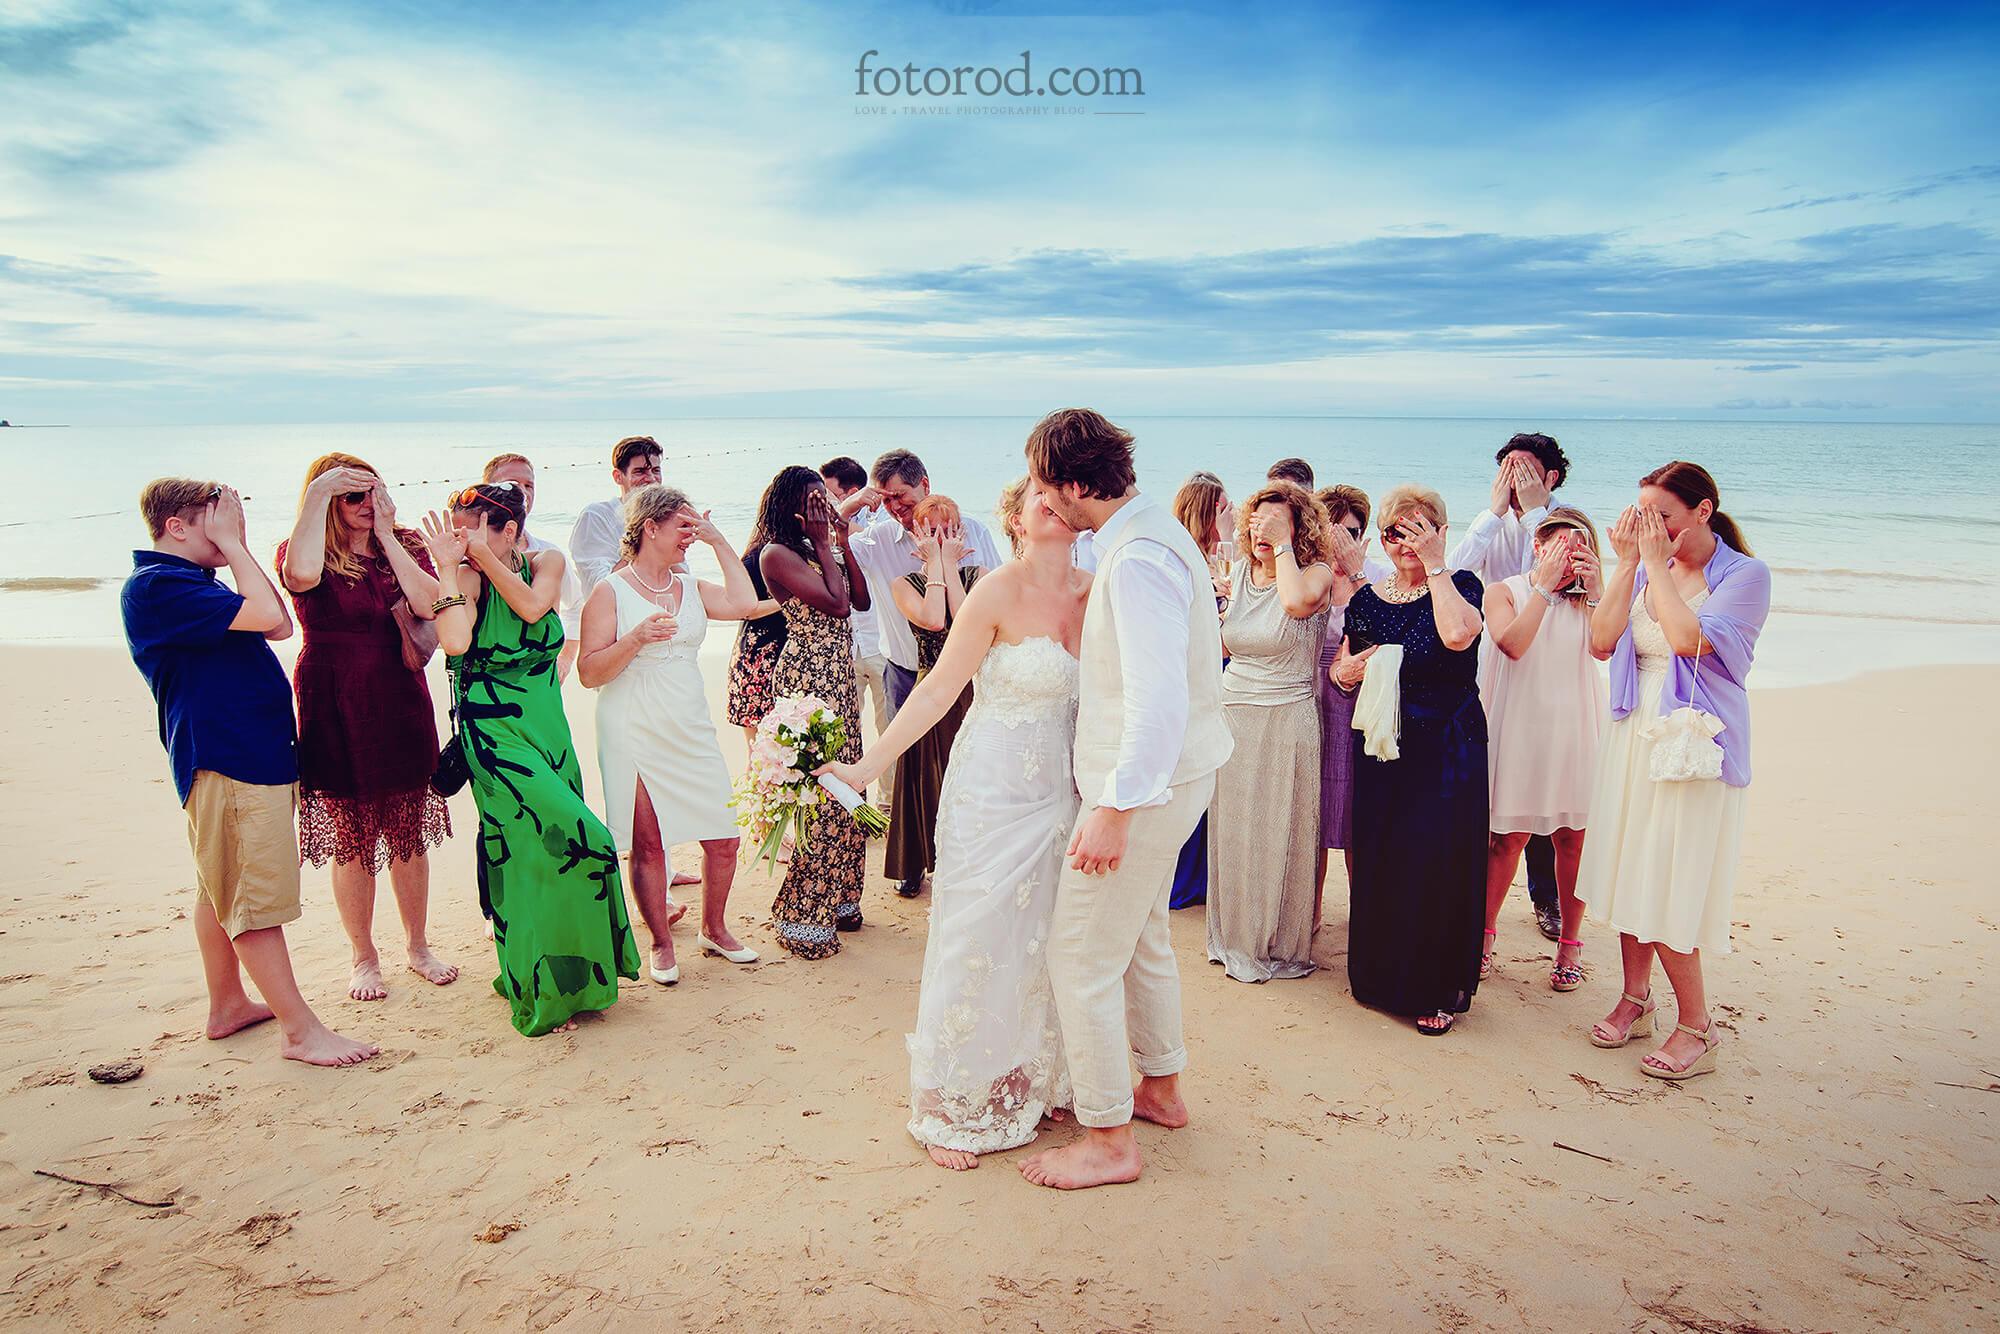 Beach Wedding Khaolak - Phuket Photographer, Hire a Photographer in